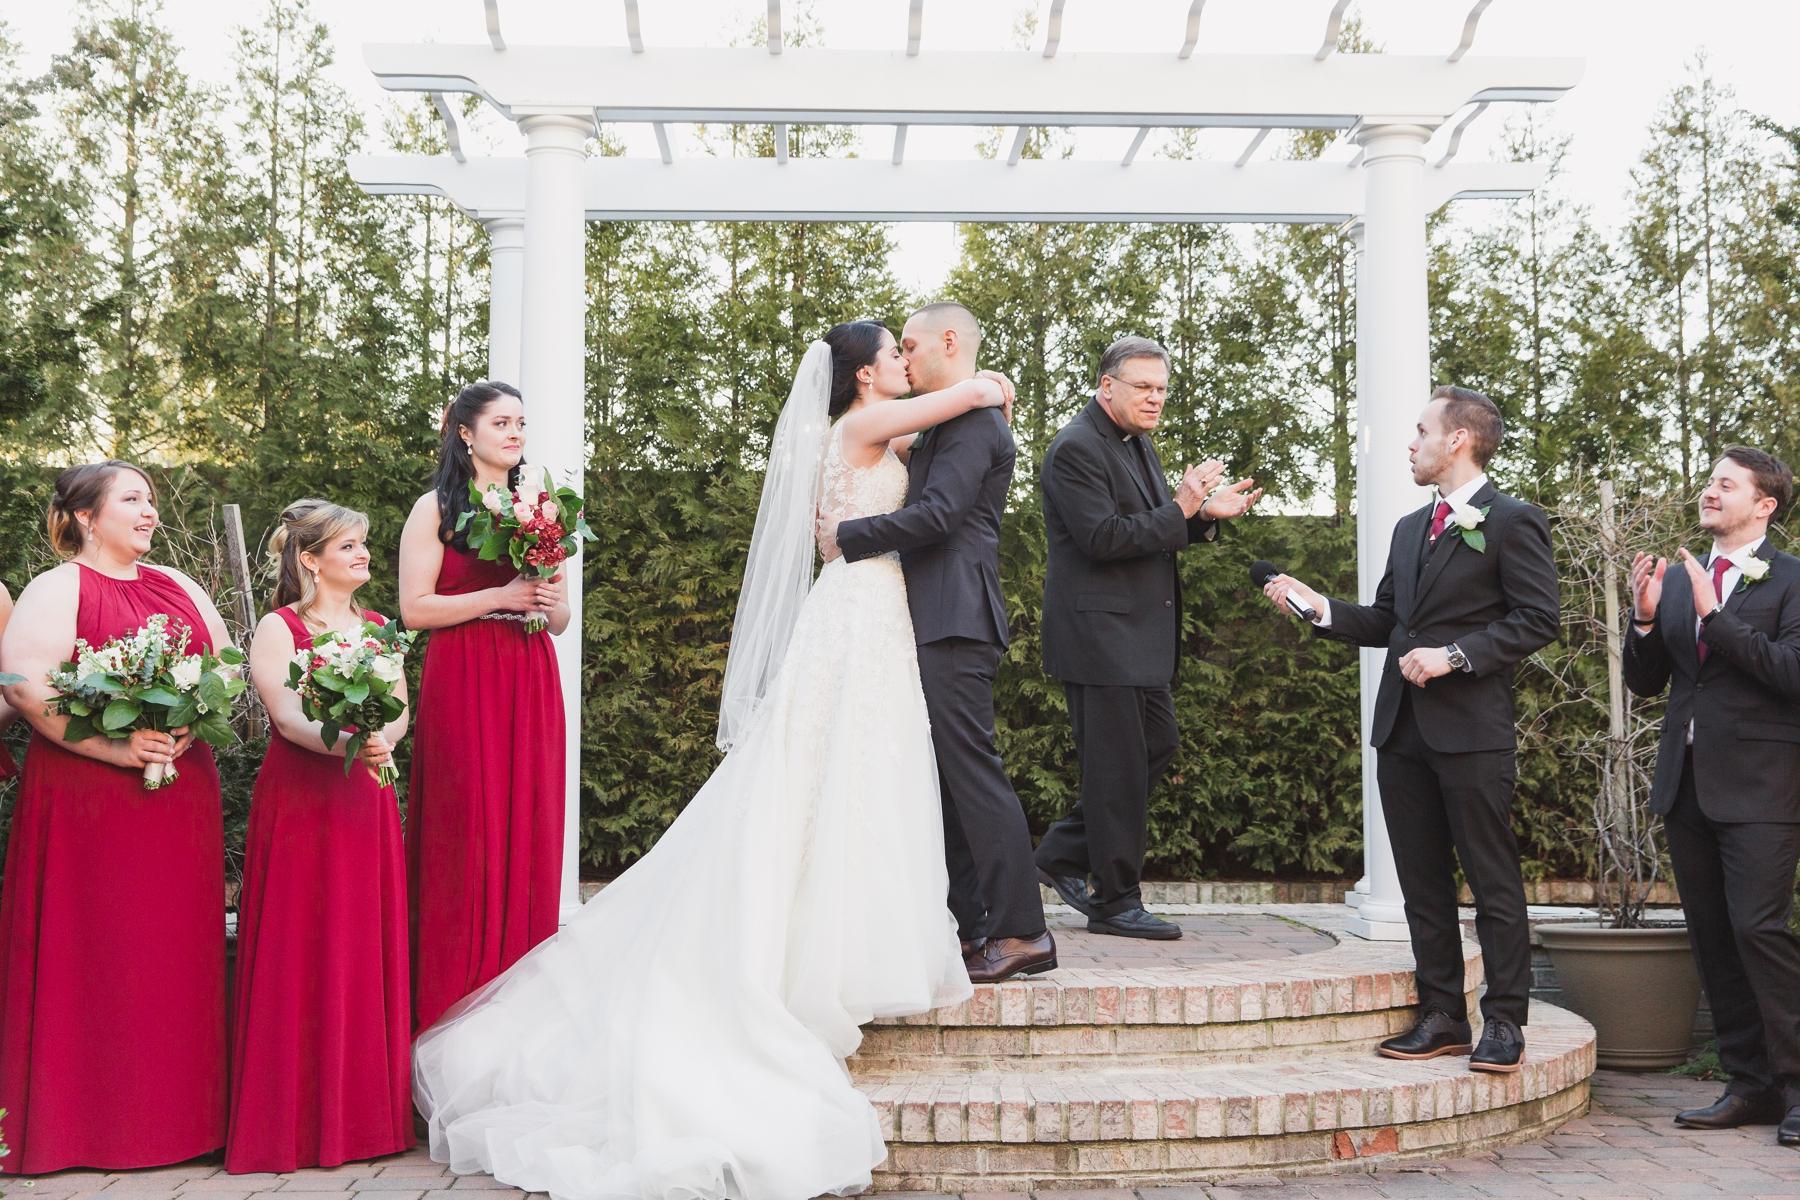 Wedding Freehold NJ Limelight Entertainment